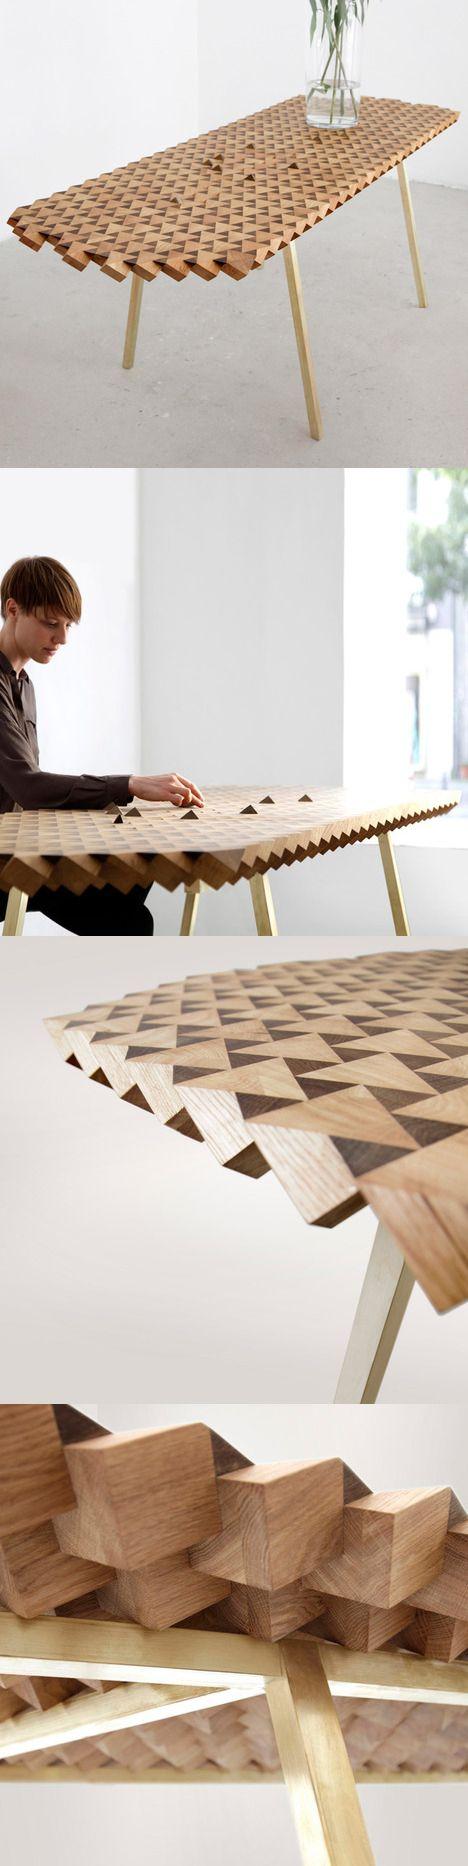 Atlas Table By Gunnar Ronsch Stephen Molloy Wood Furniture Design Furniture Design Furniture